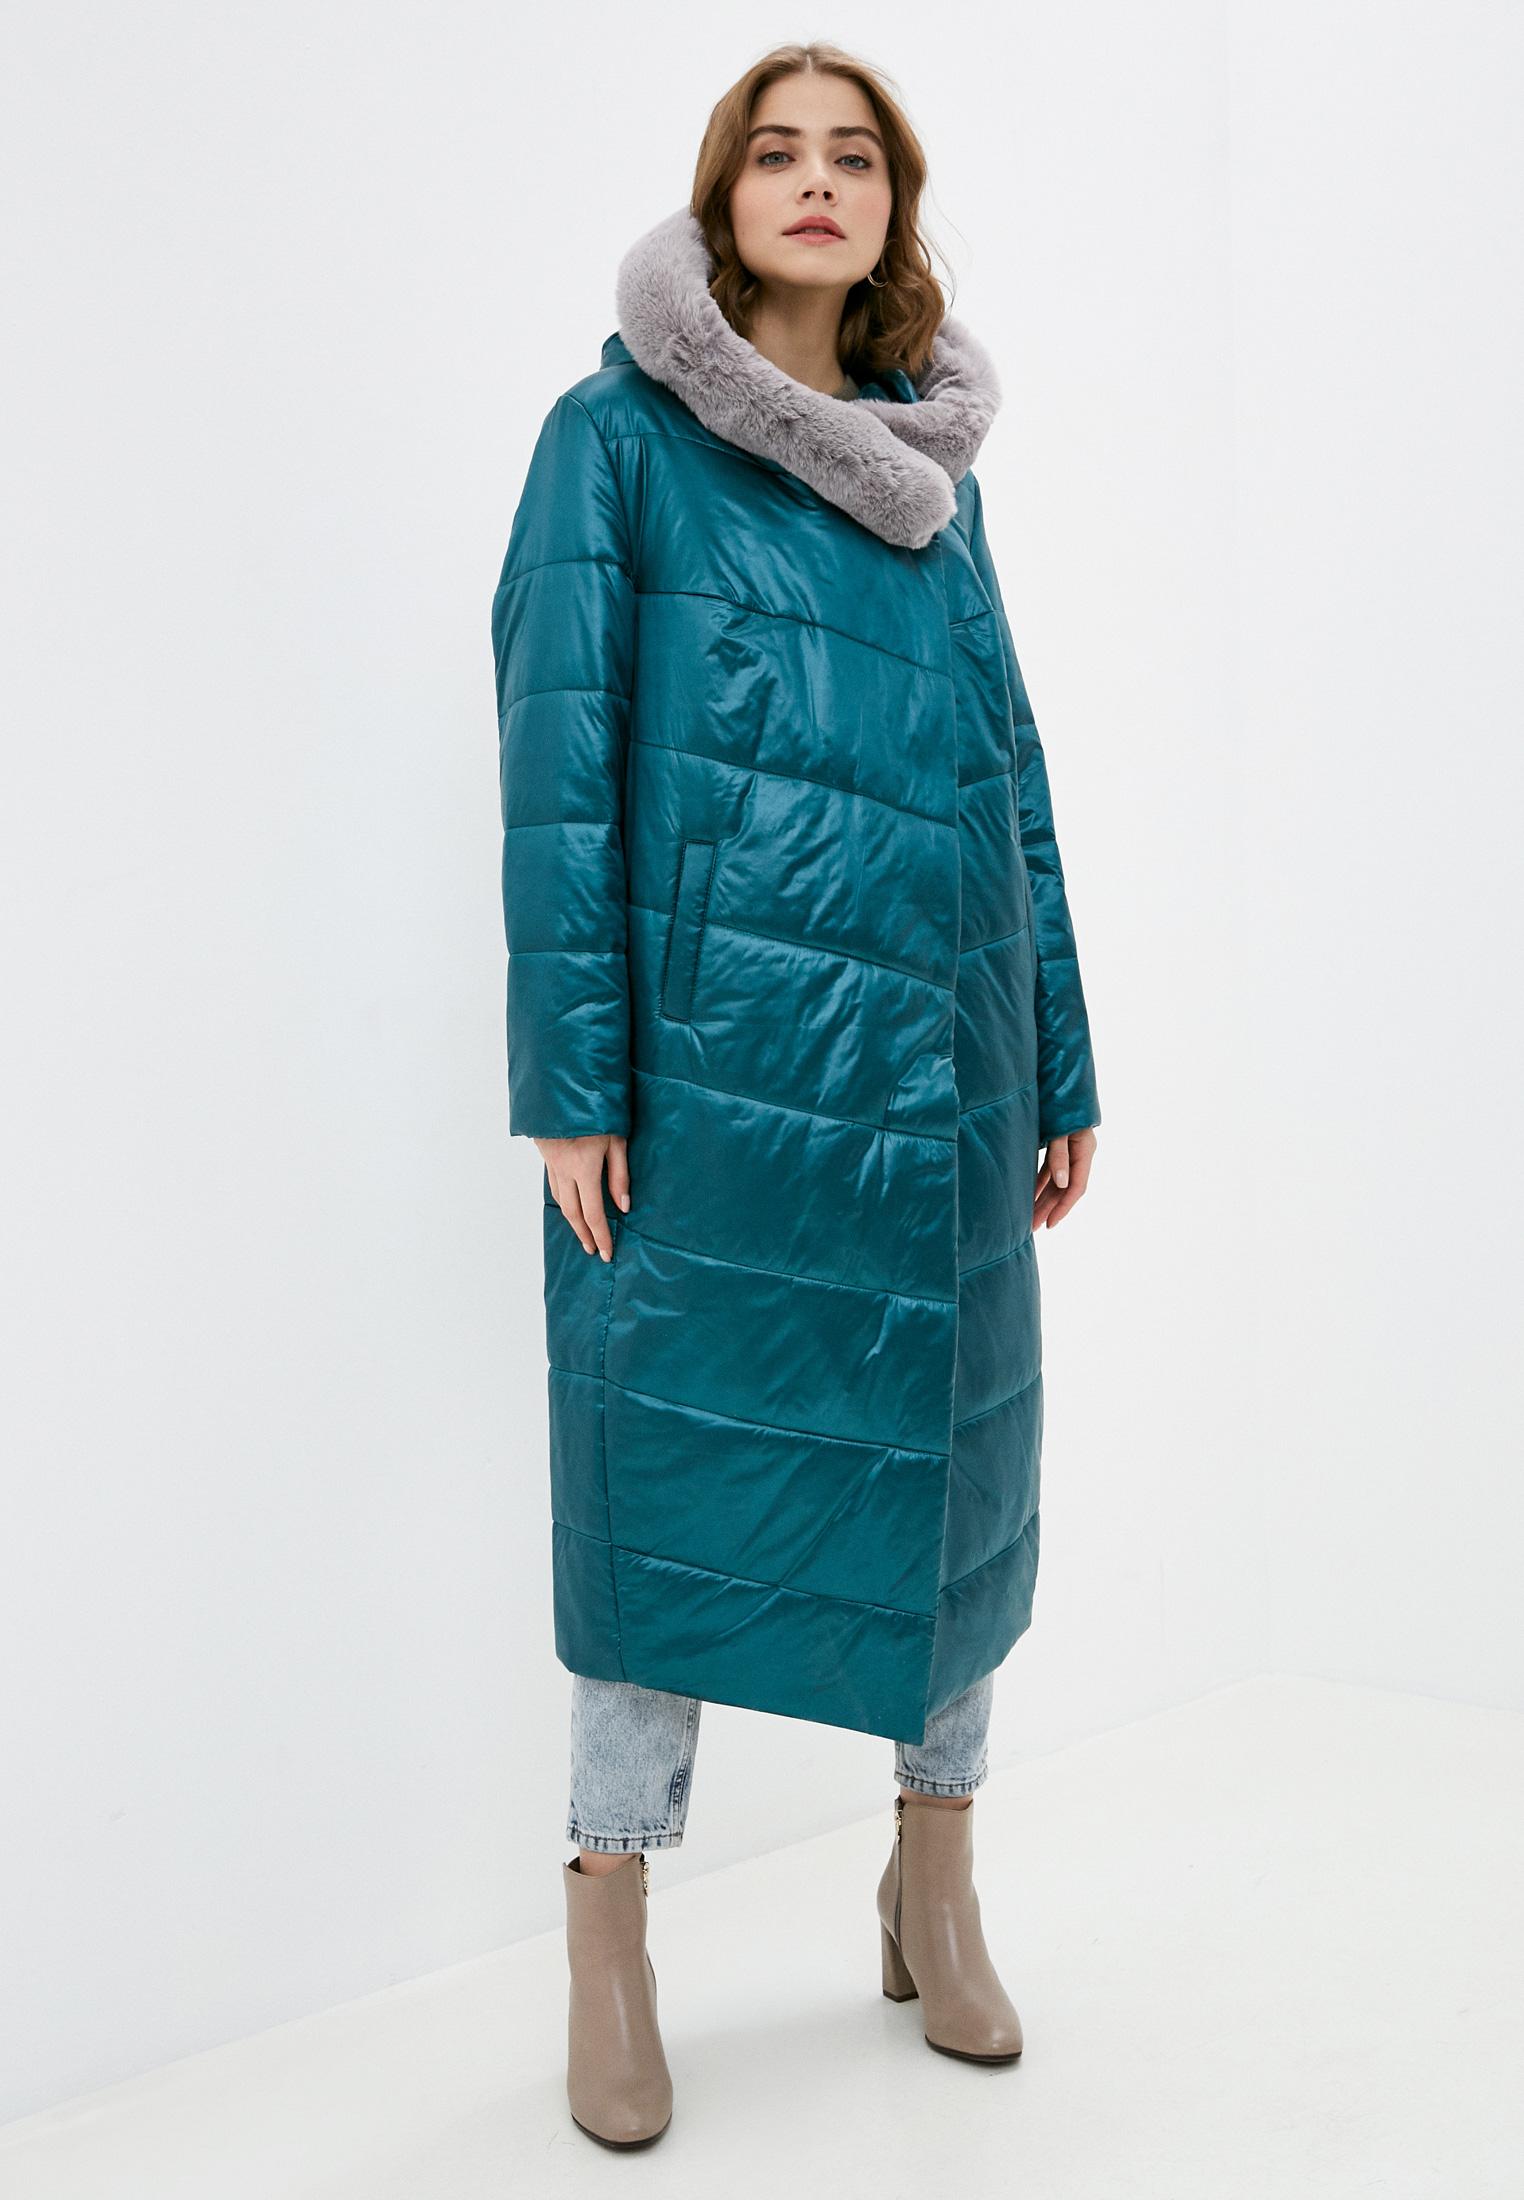 Пуховик Nataliy Beate Пальто  мод 123д